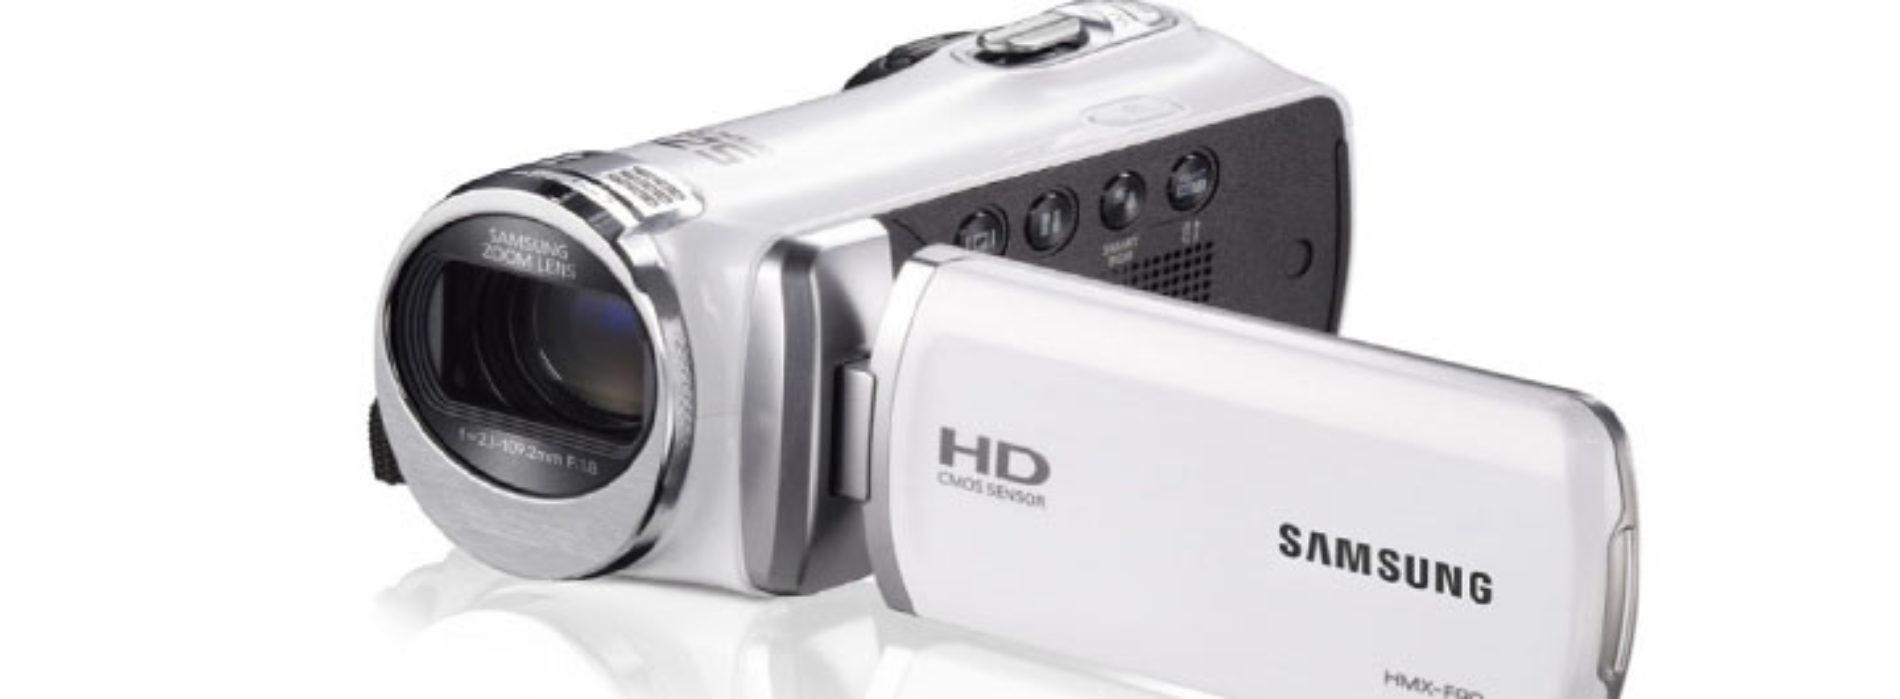 Ремонт видеокамер Samsung